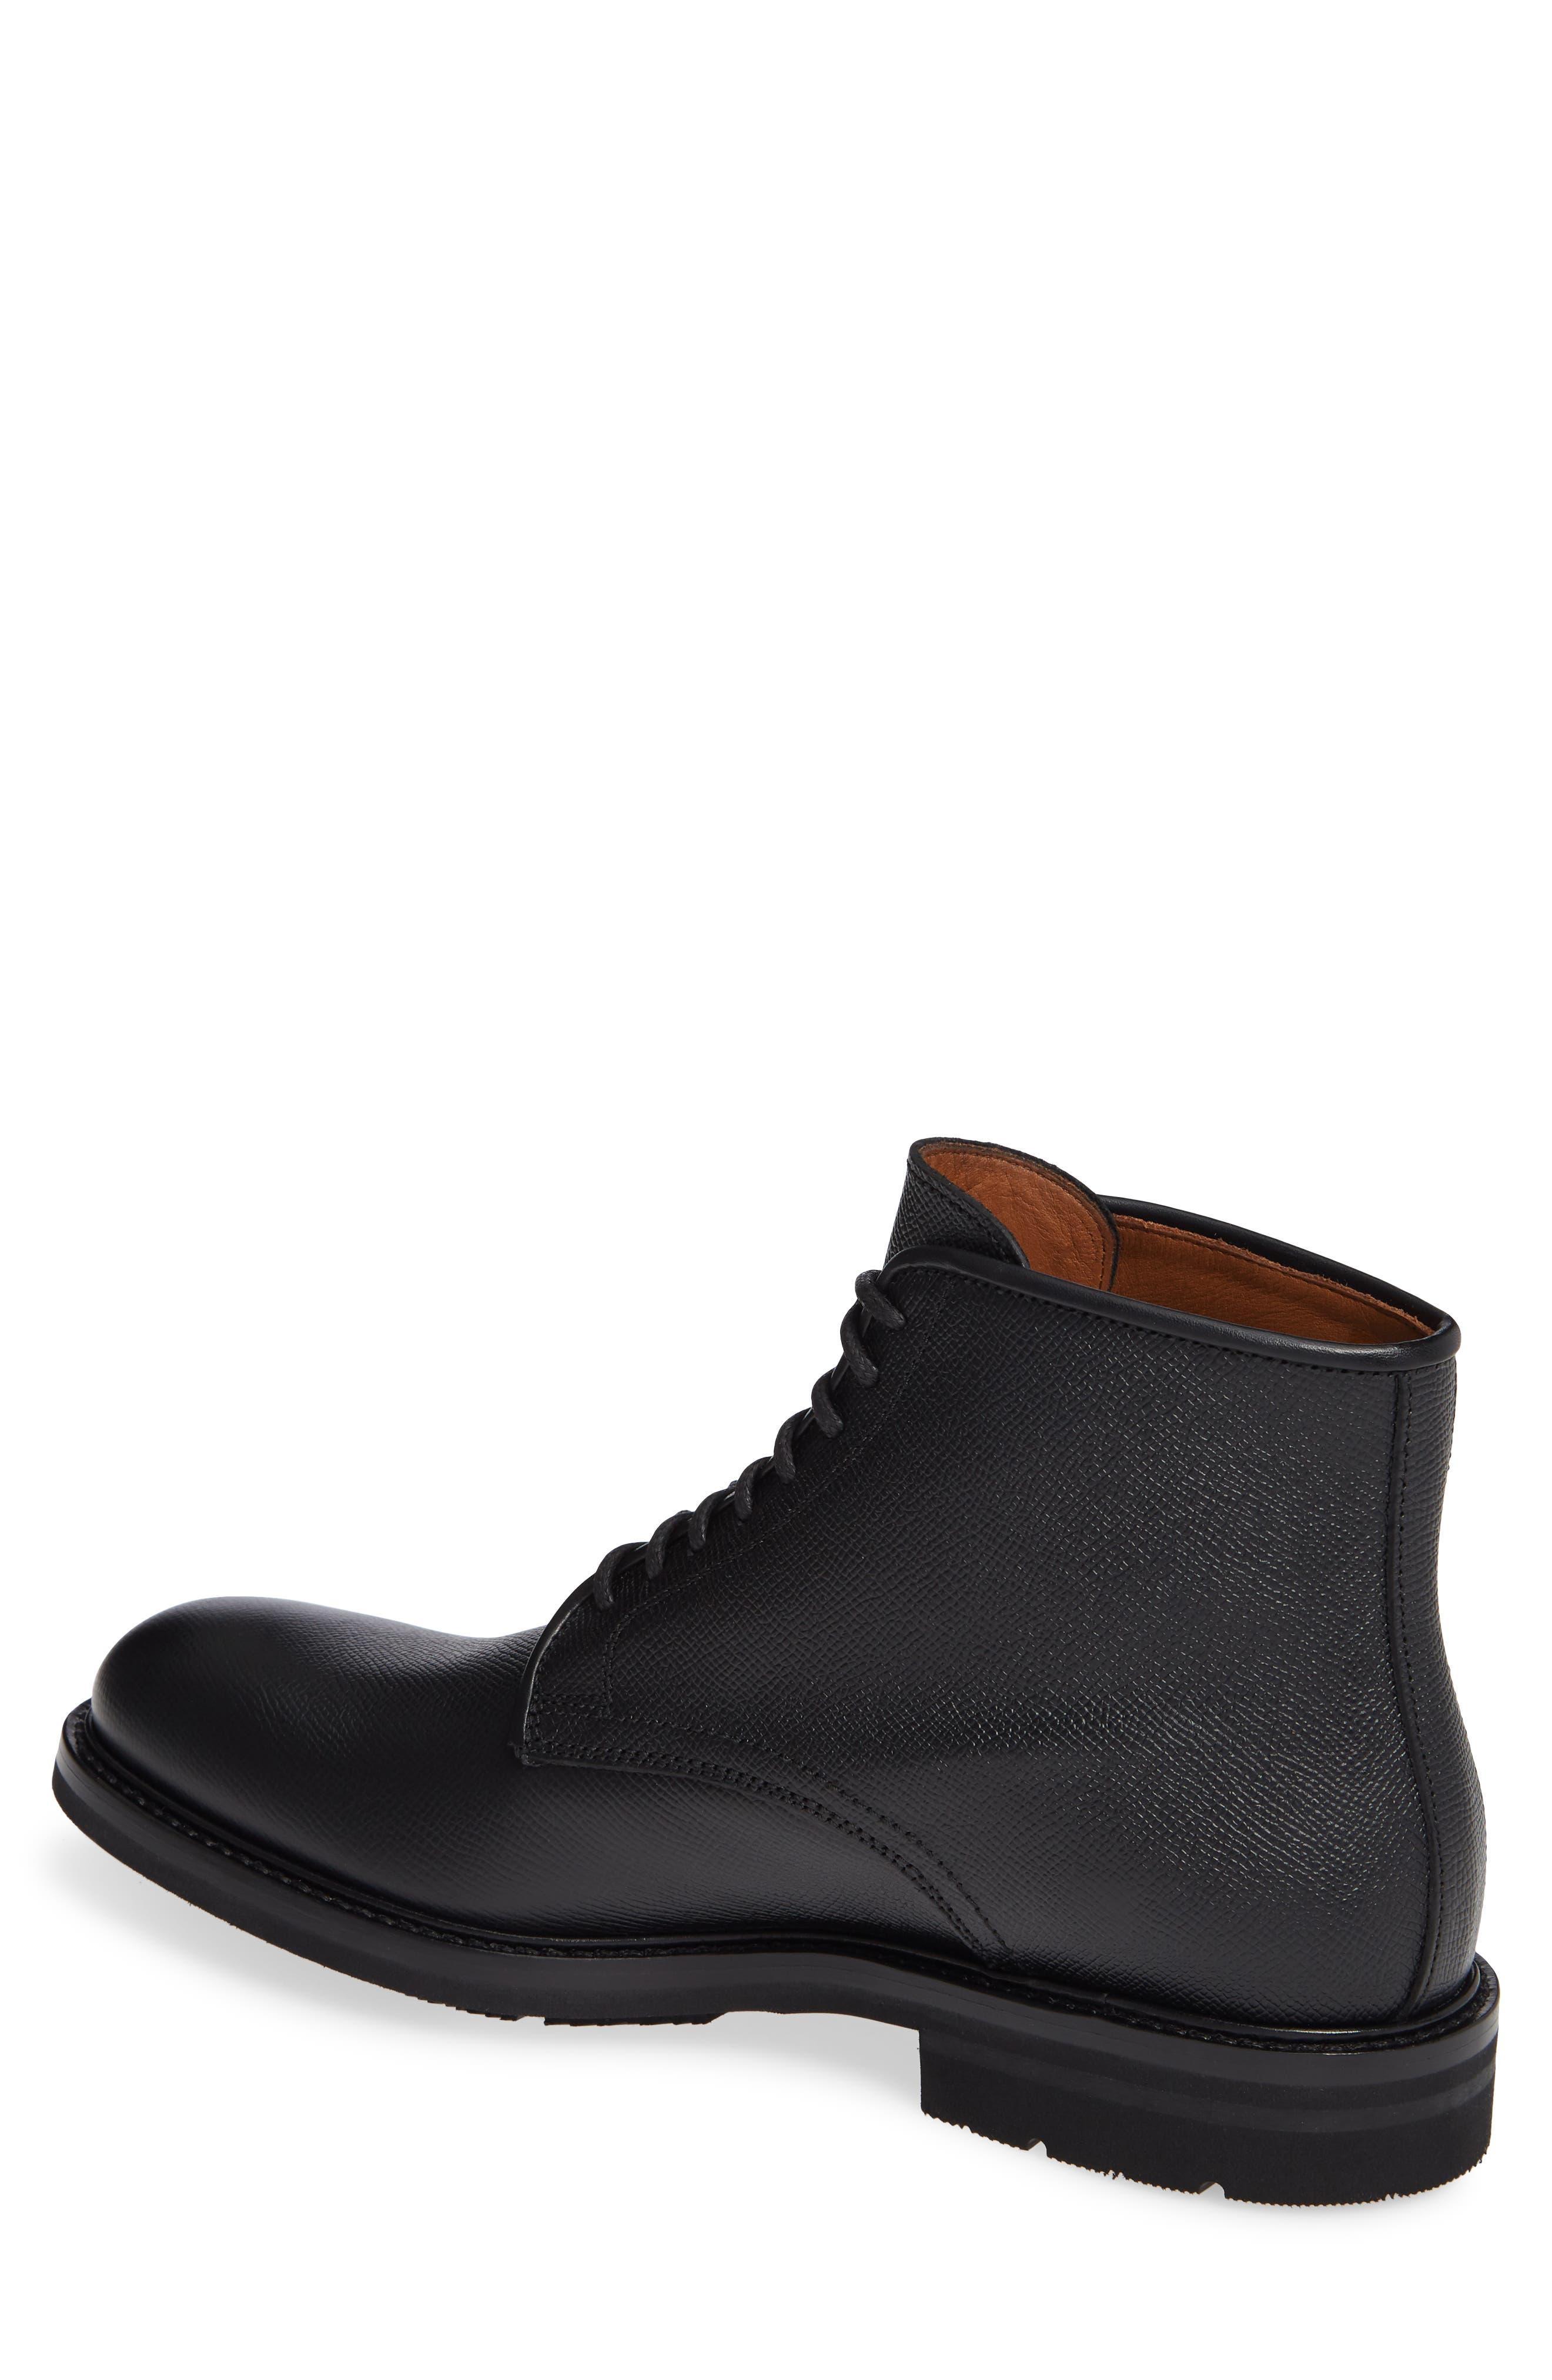 Renzo Weatherproof Plain Toe Waterproof Boot,                             Alternate thumbnail 2, color,                             BLACK